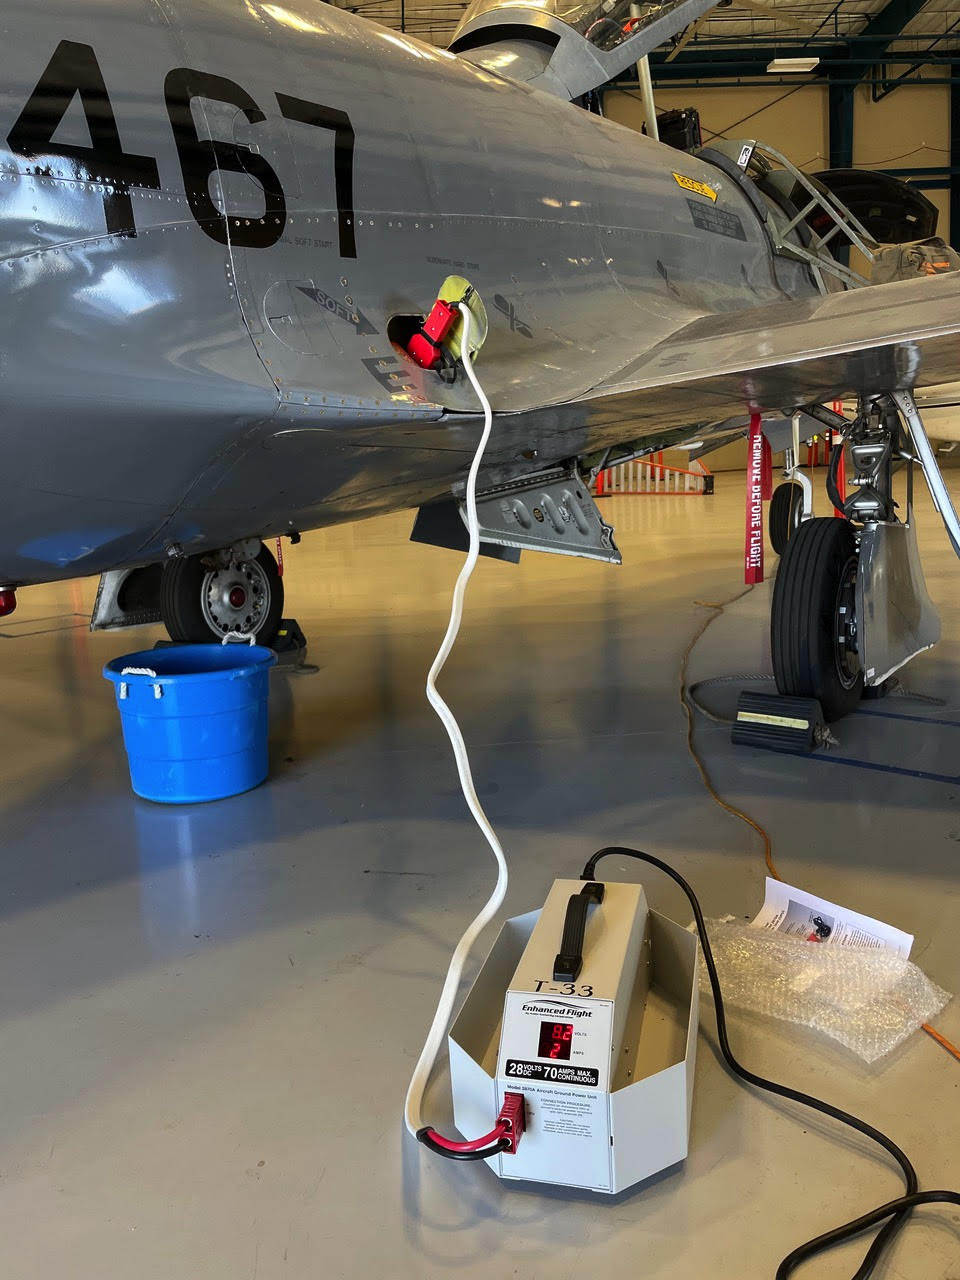 Shooting star aircraft connected to Enhanced Flight GPU